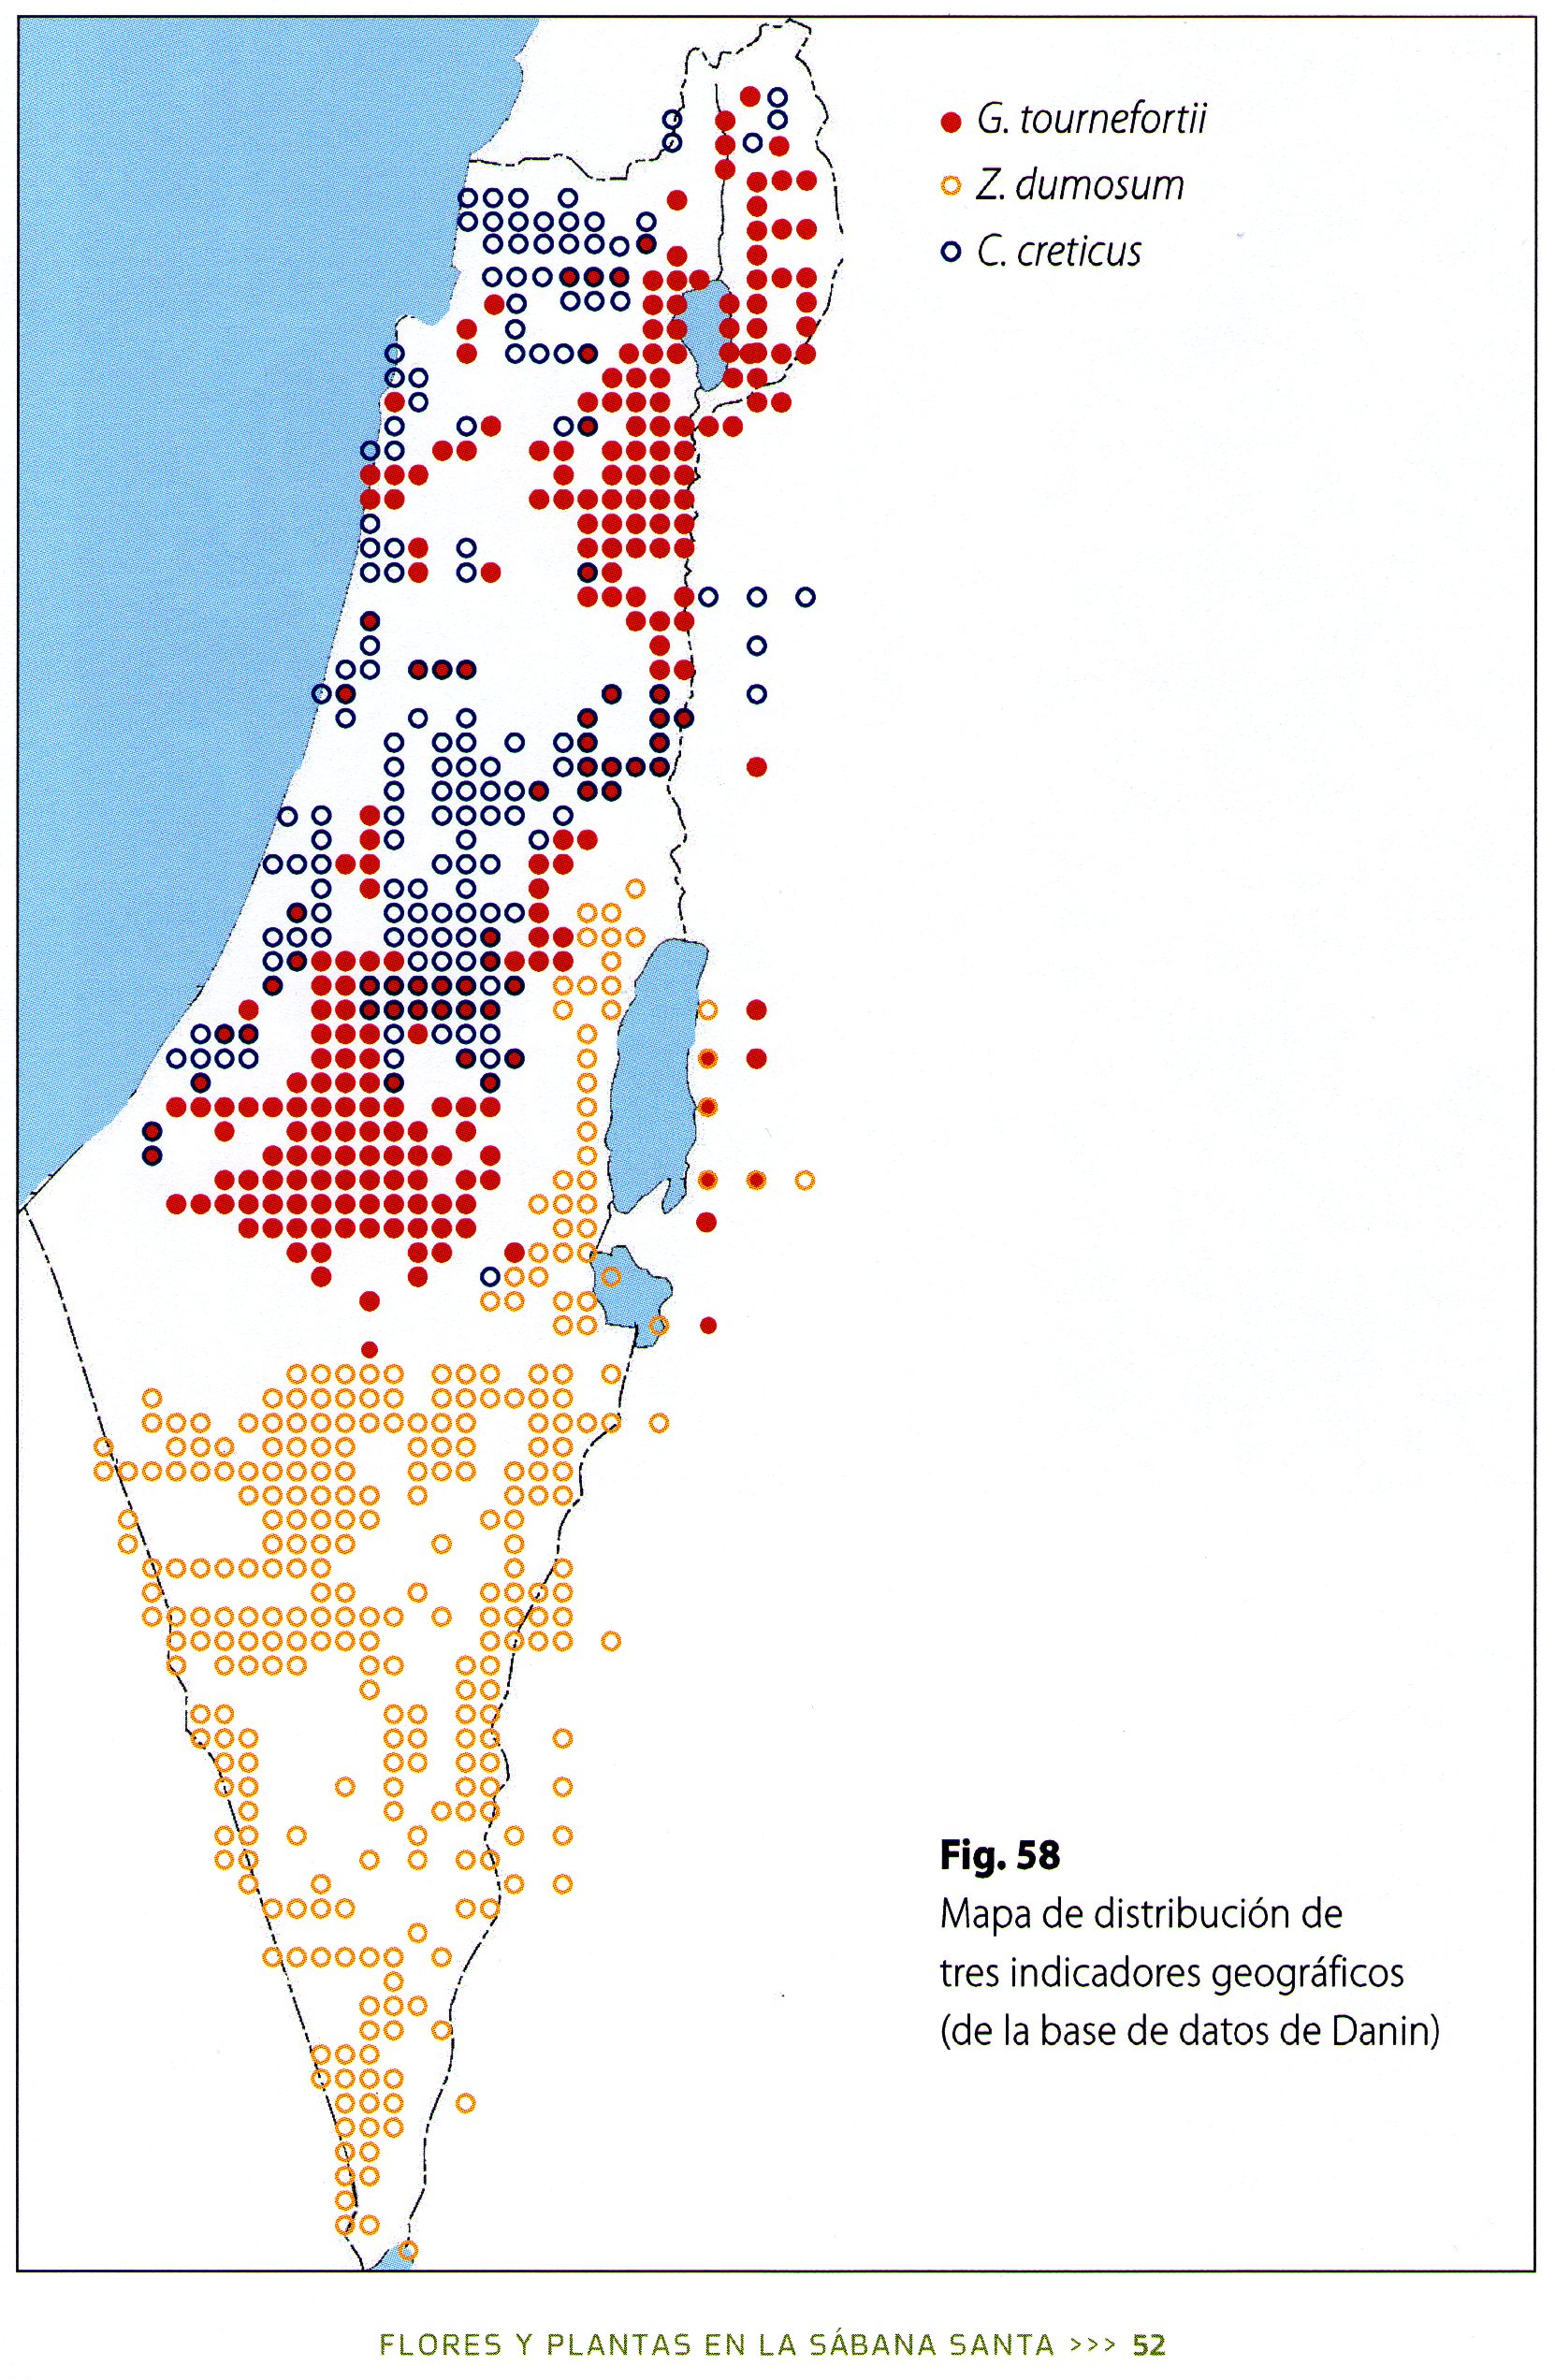 Photo 5. Distribution maps of the three geographics indicators